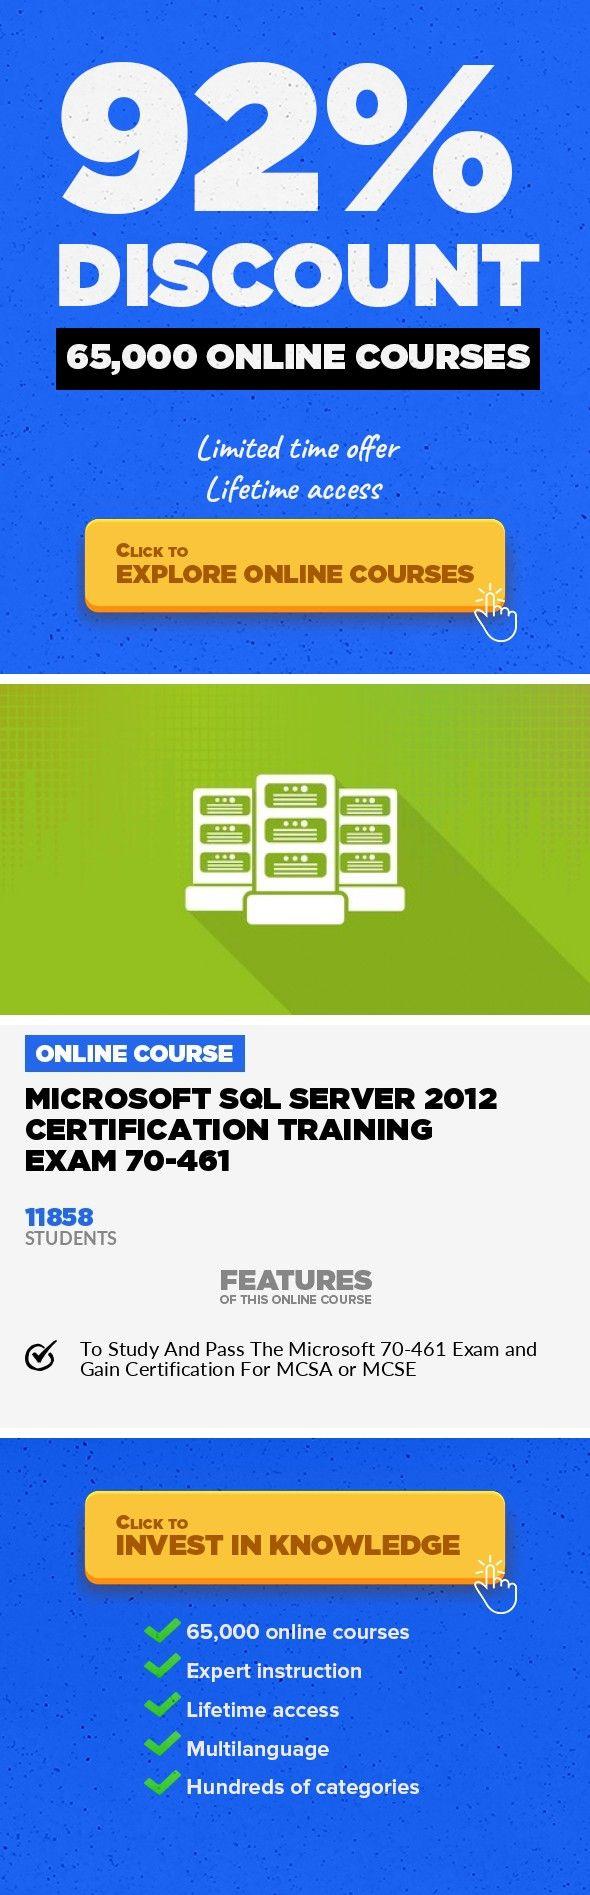 Microsoft Sql Server 2012 Certification Training Exam 70 461